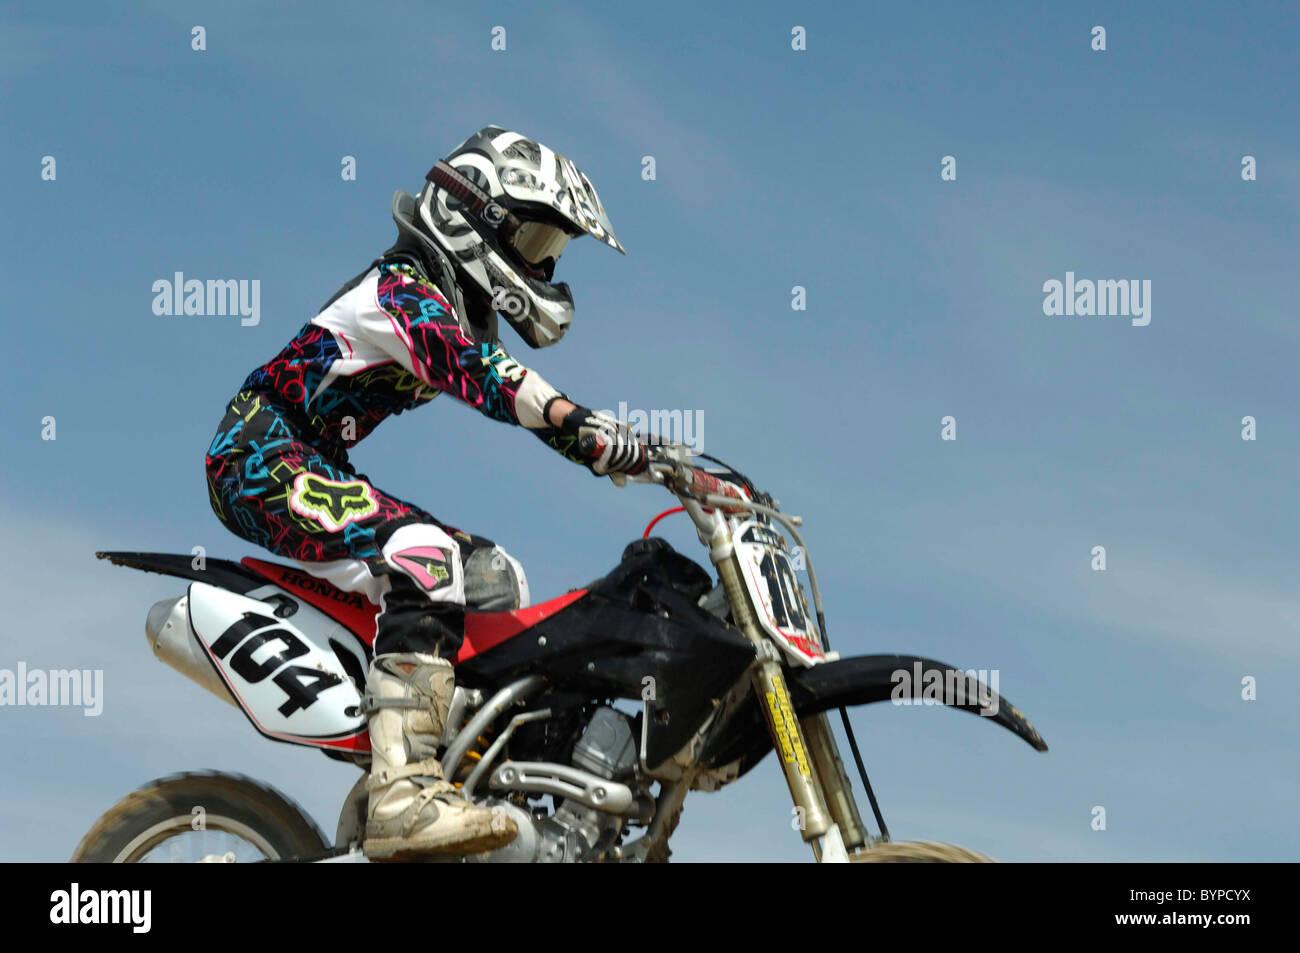 Motocross Motocross Racing Dirt Bike Dirtbike Stock Photo Alamy